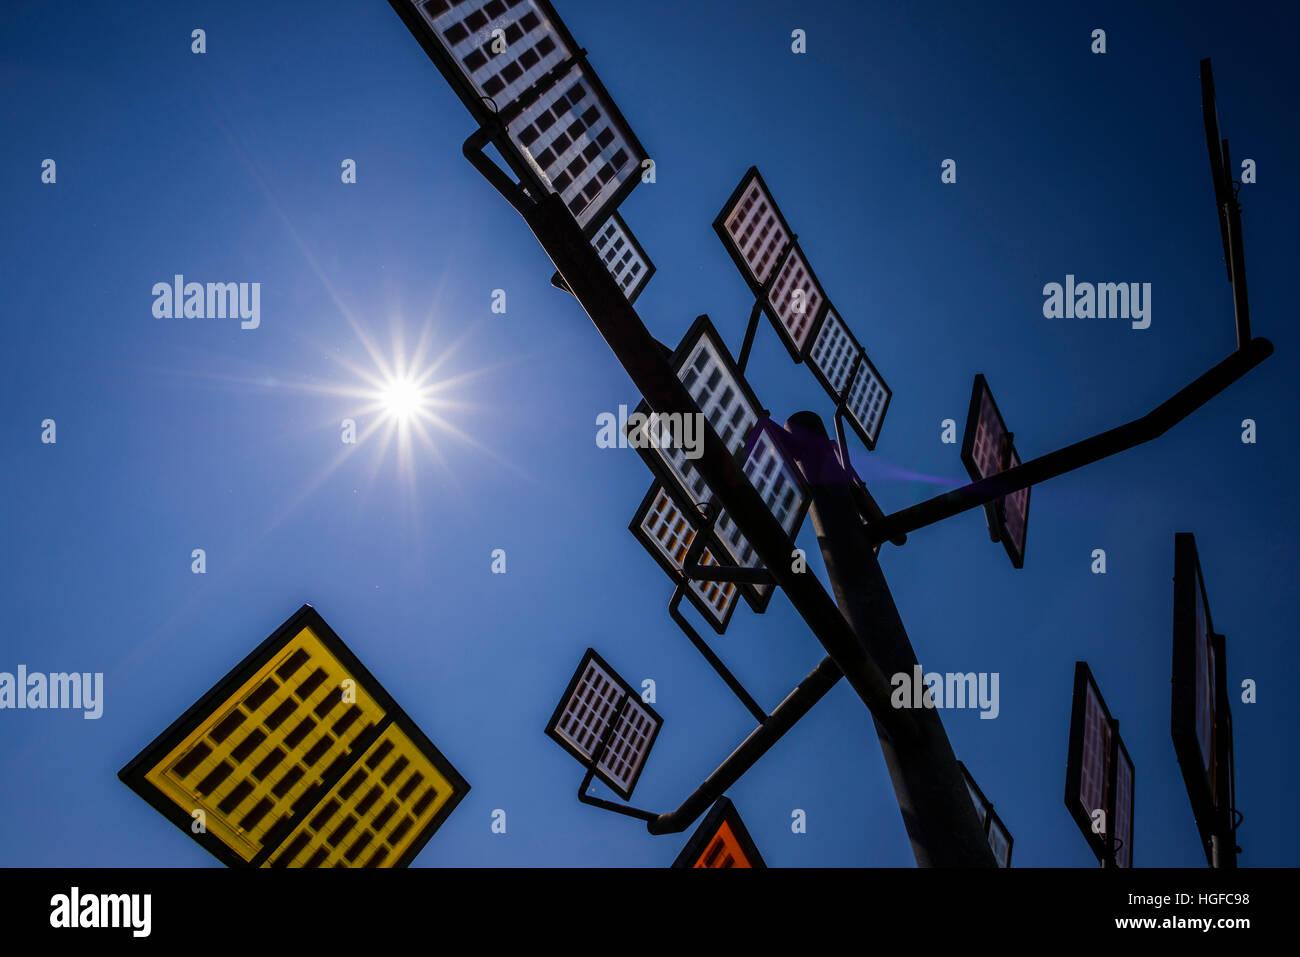 Panneaux solaires, Solarbaum, Ulmer Wohnviertel Ville solaire, Ulm, Photo Stock